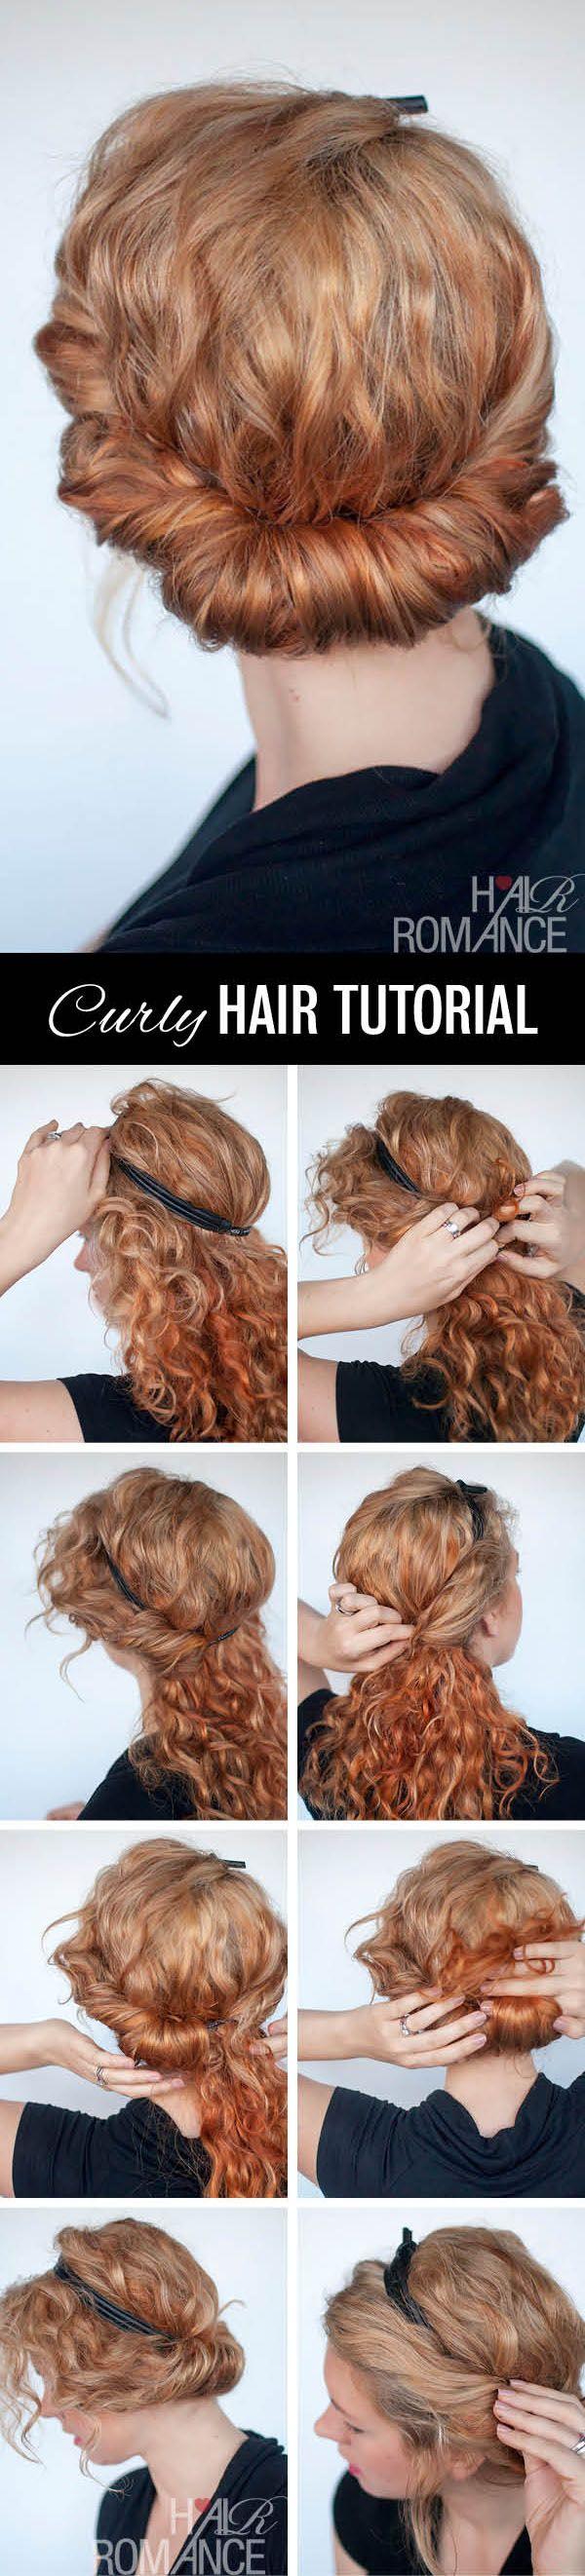 tuto coiffure headband cheveux boucles